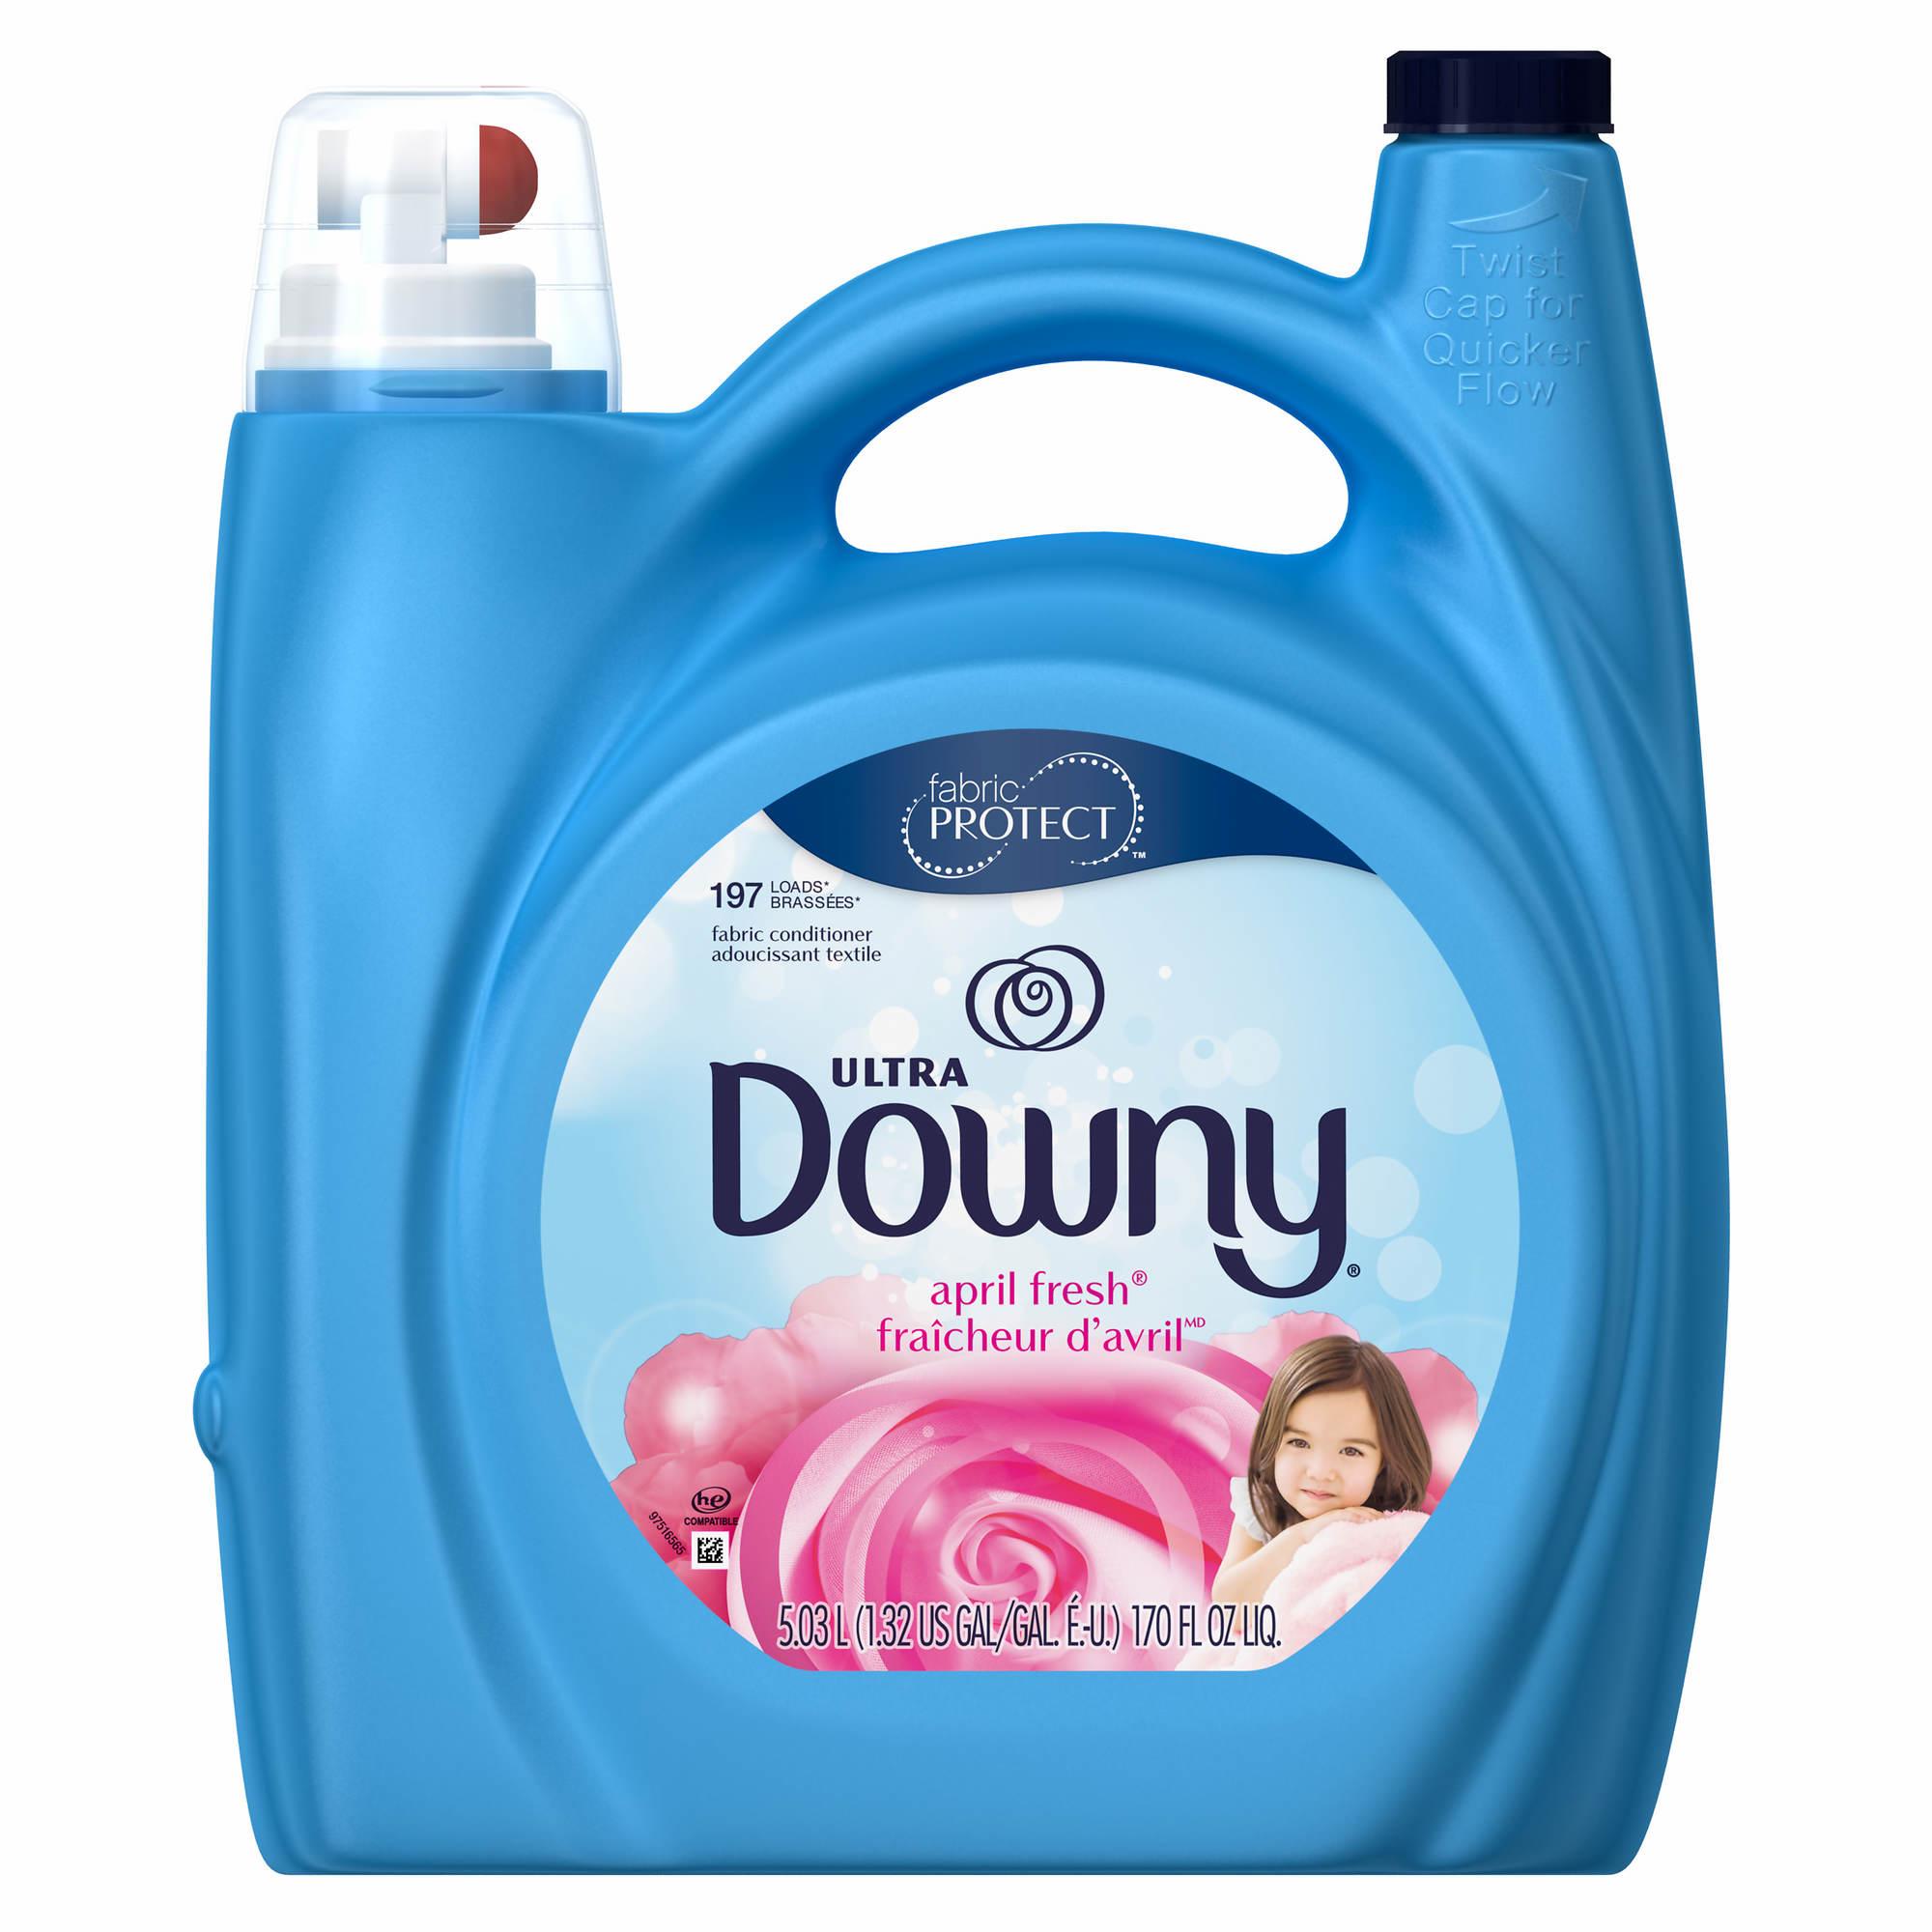 Downy April Fresh Liquid Fabric Enhancers, 170 oz.